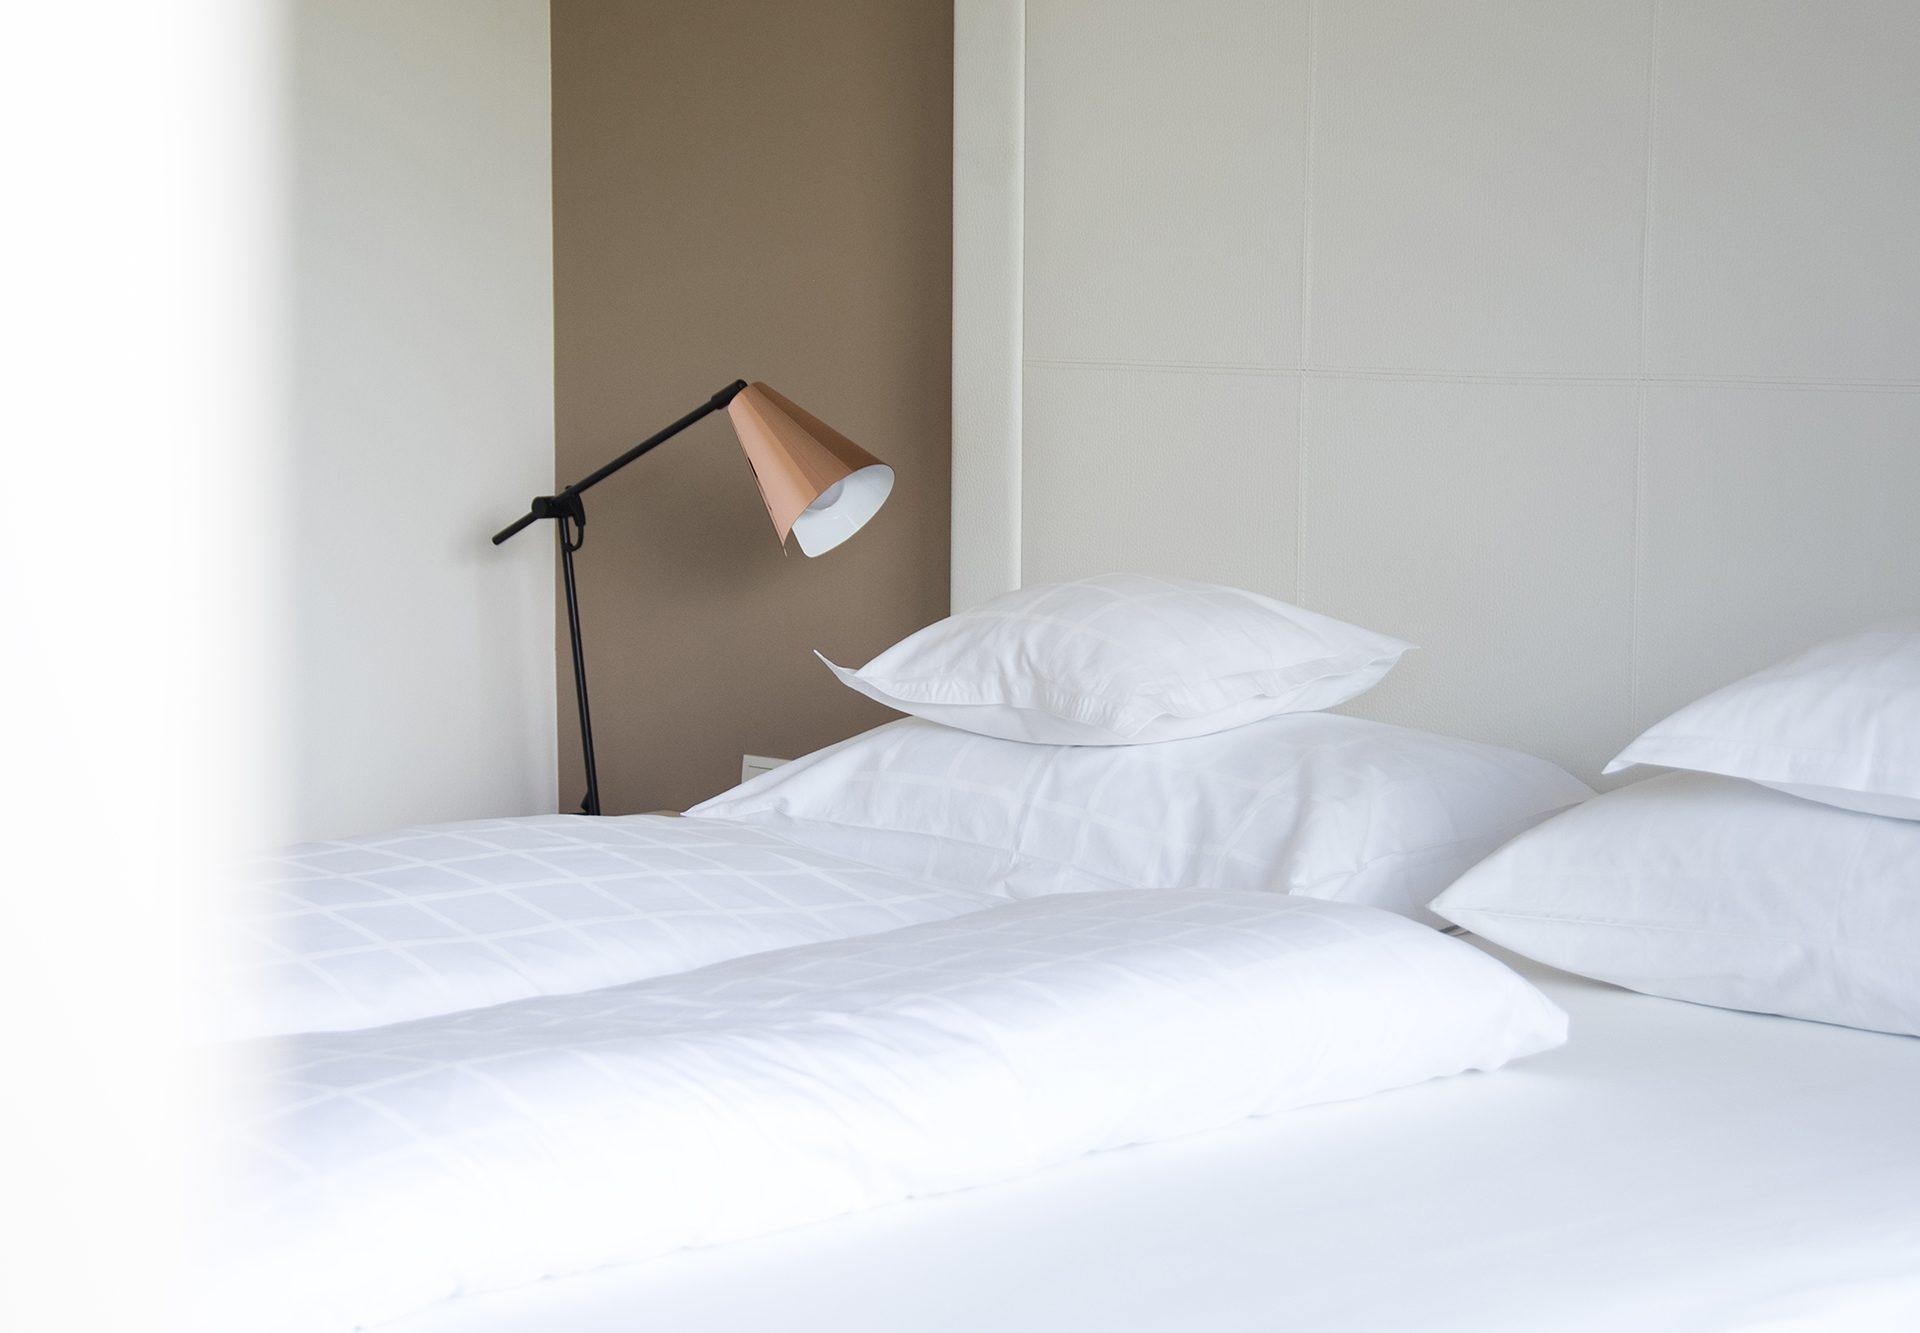 Zimmer Doppelbett Lampe